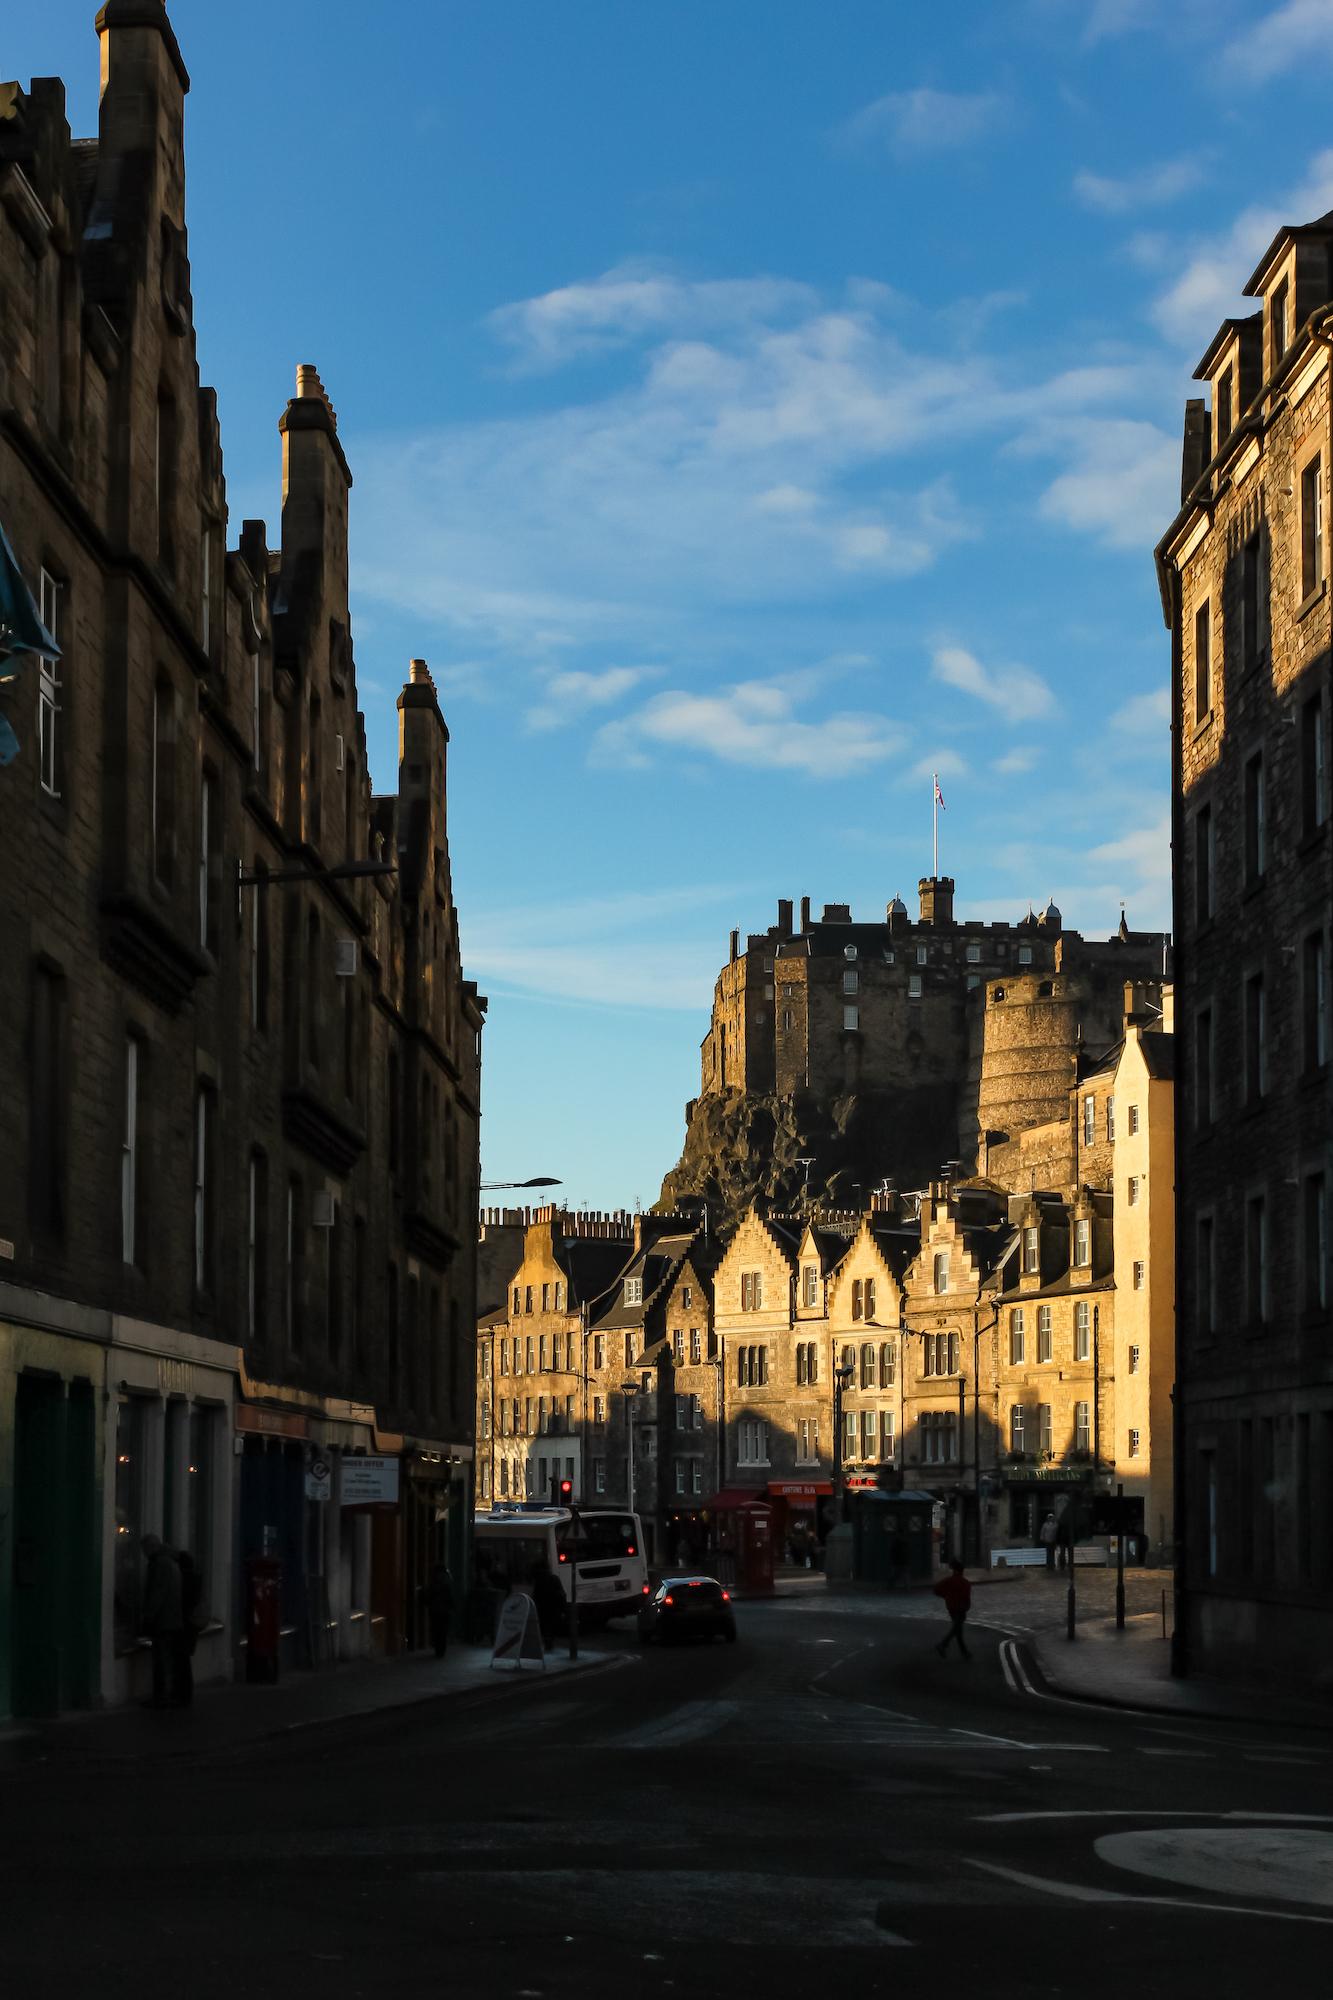 (586) Cowgatehead to the Grassmarket and Edinburgh Castle, Edinburgh, Scotland.jpg